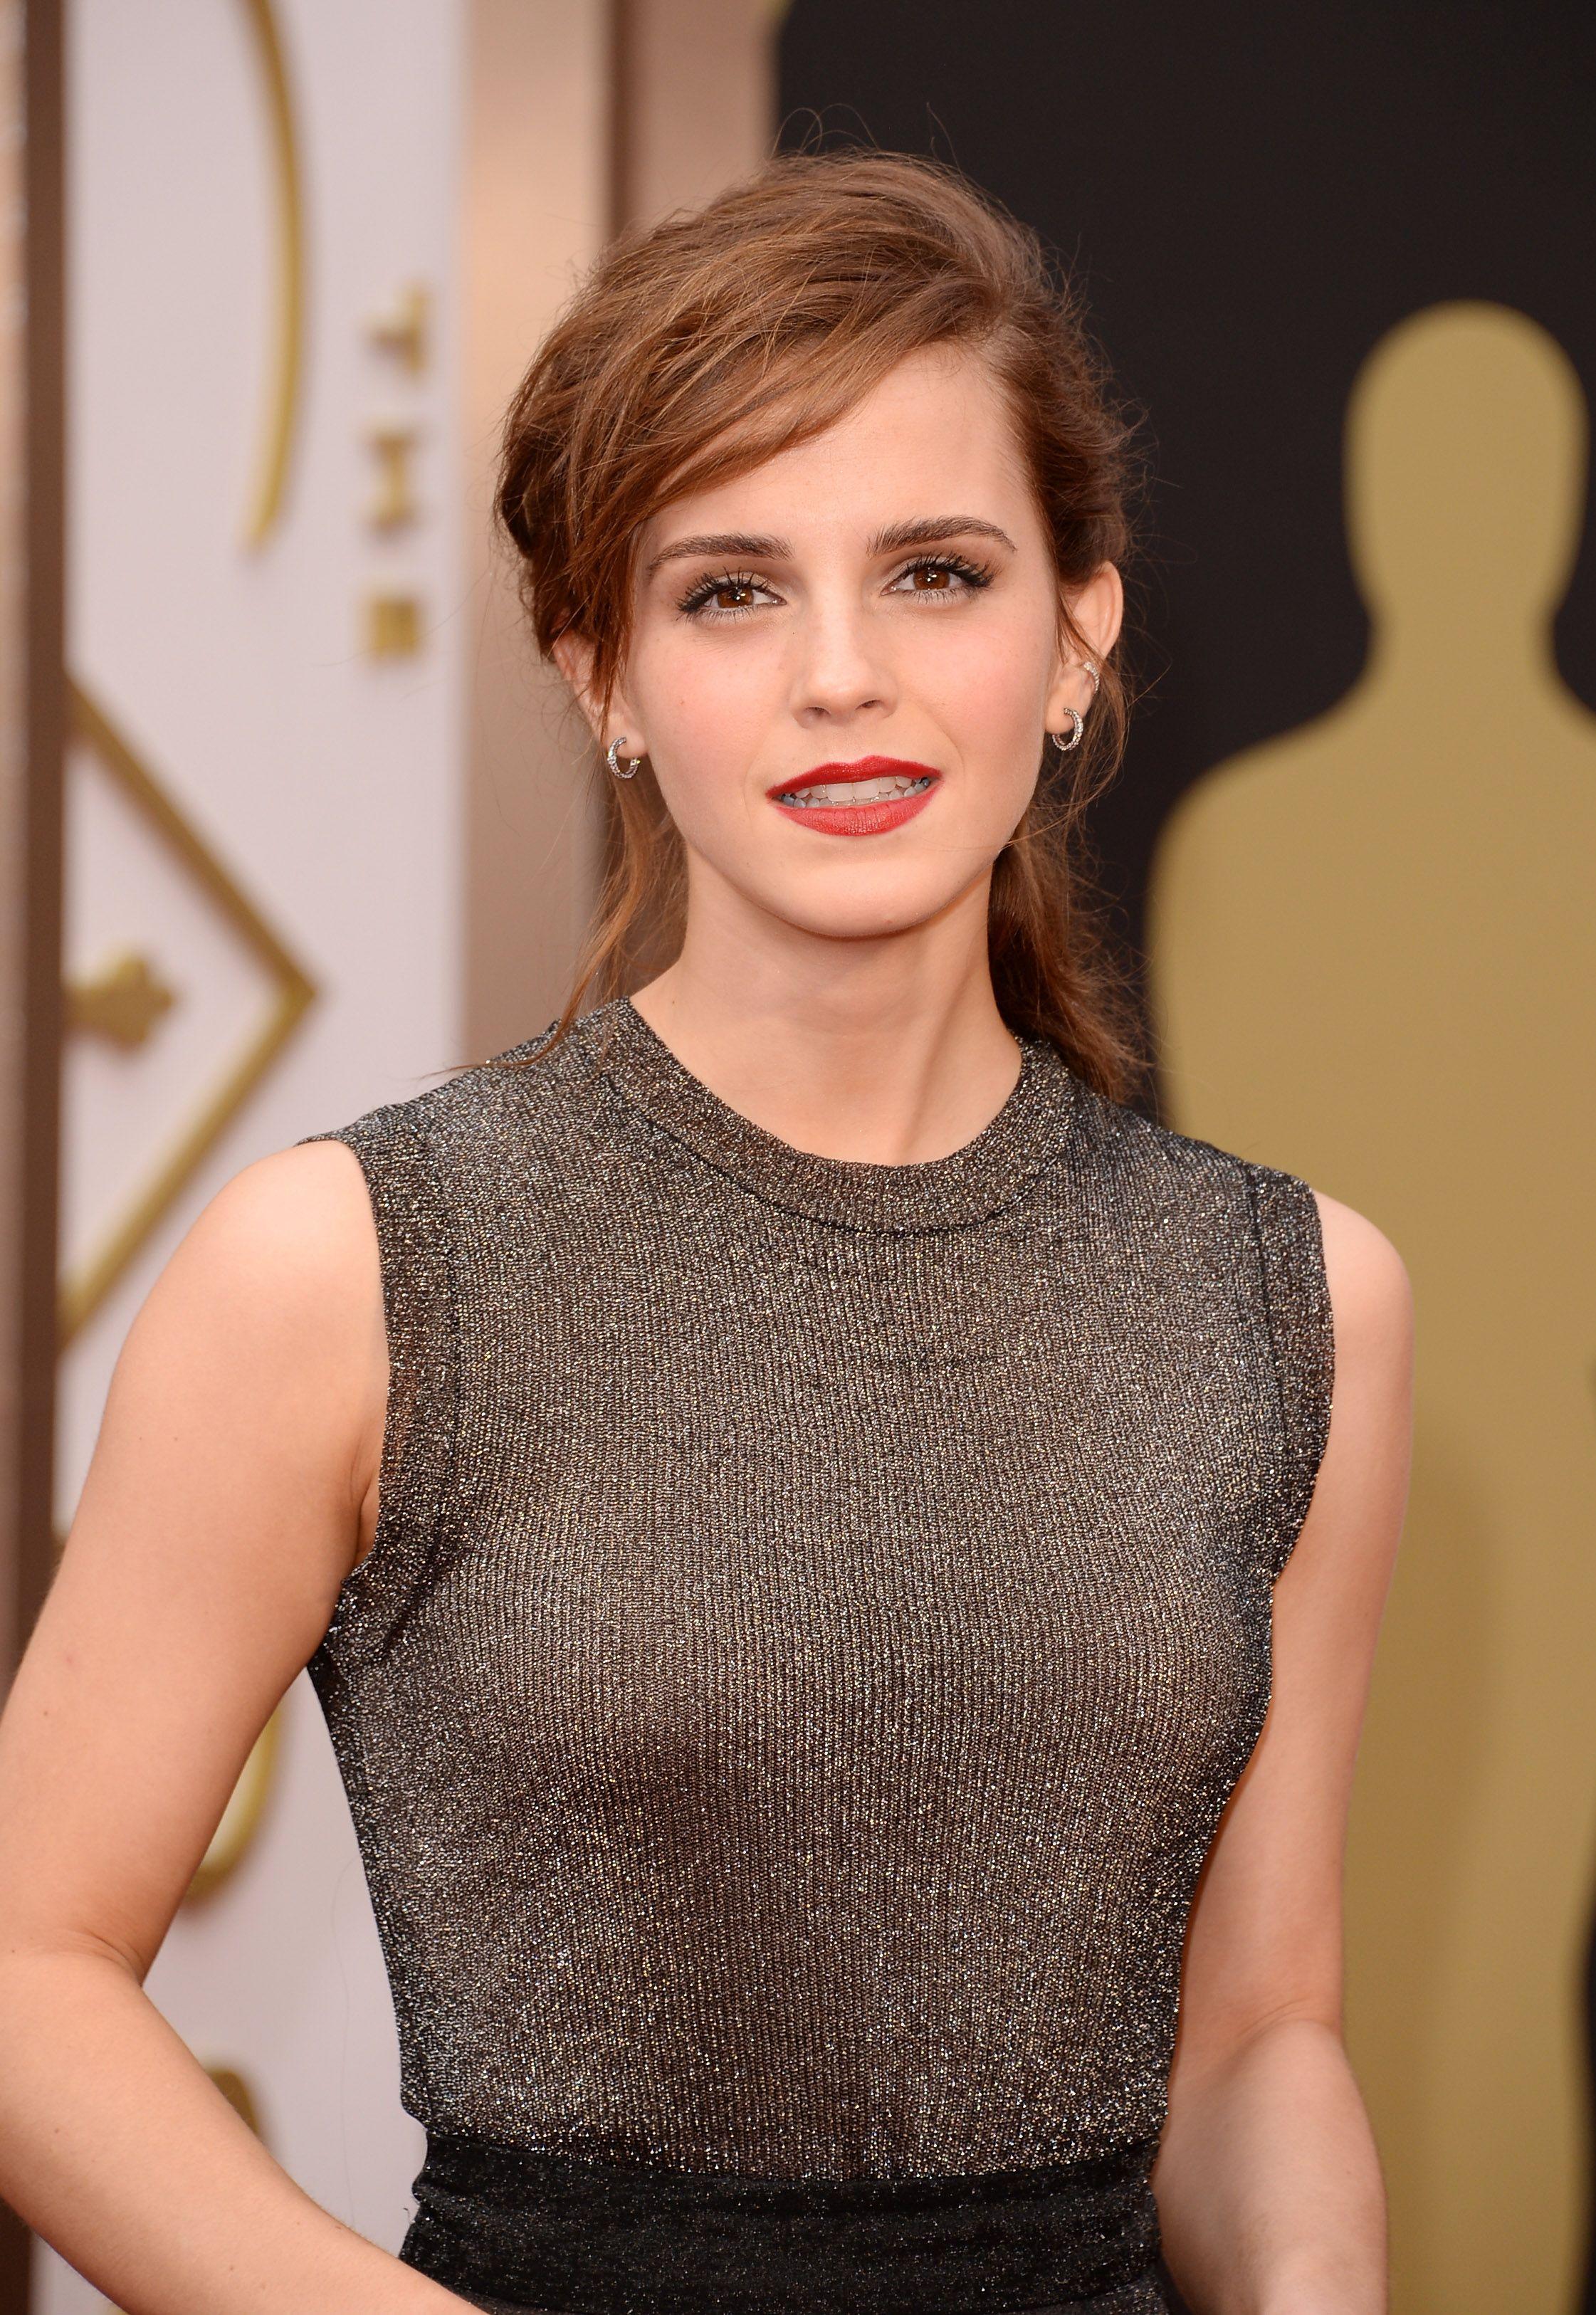 Emma-Watson-wallpapers1